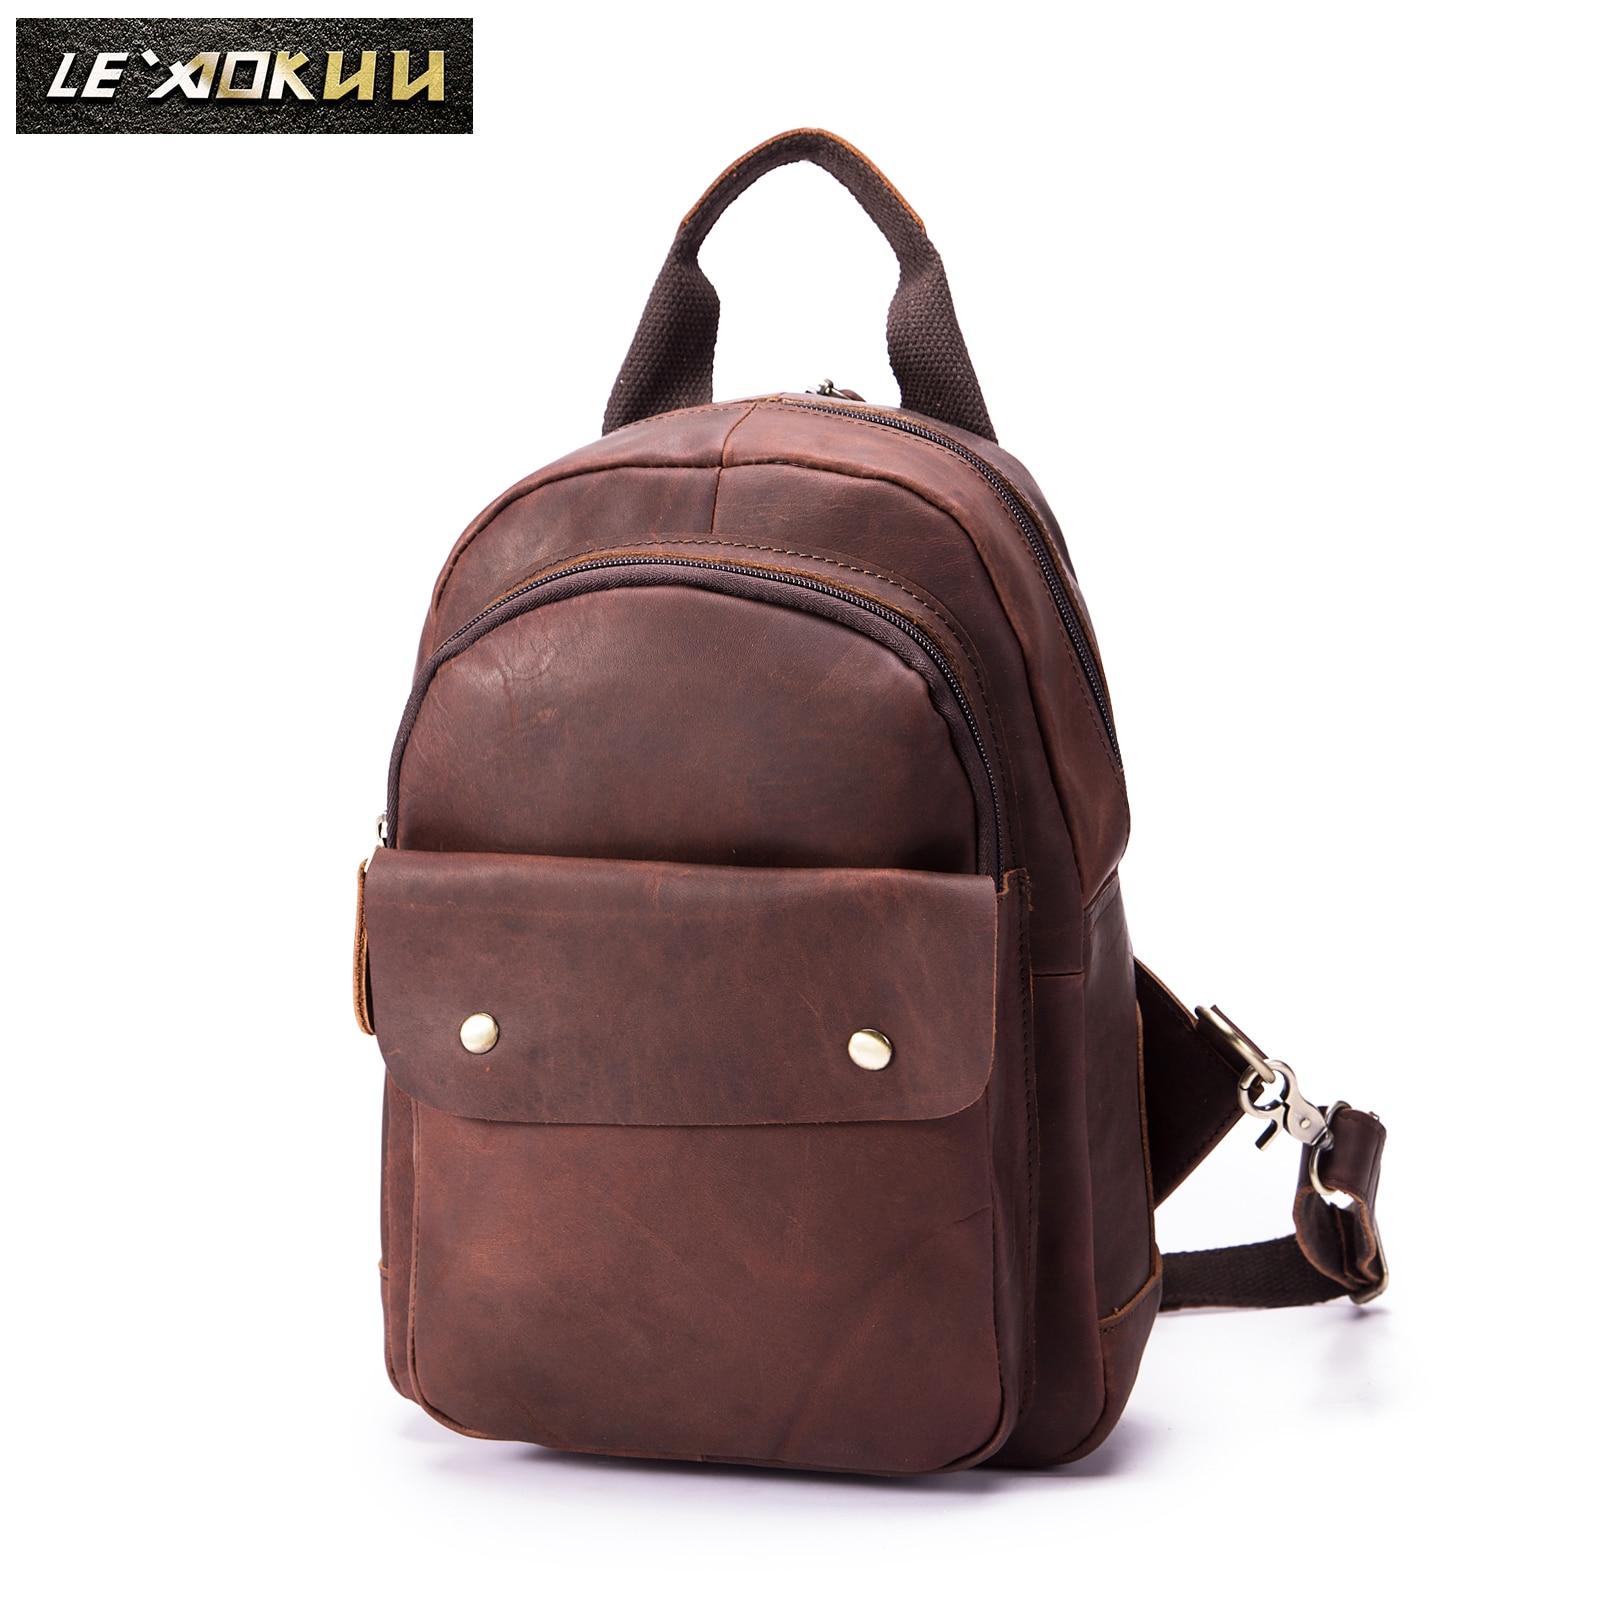 School, Casual, Multi, Leather, Bag, Purpose